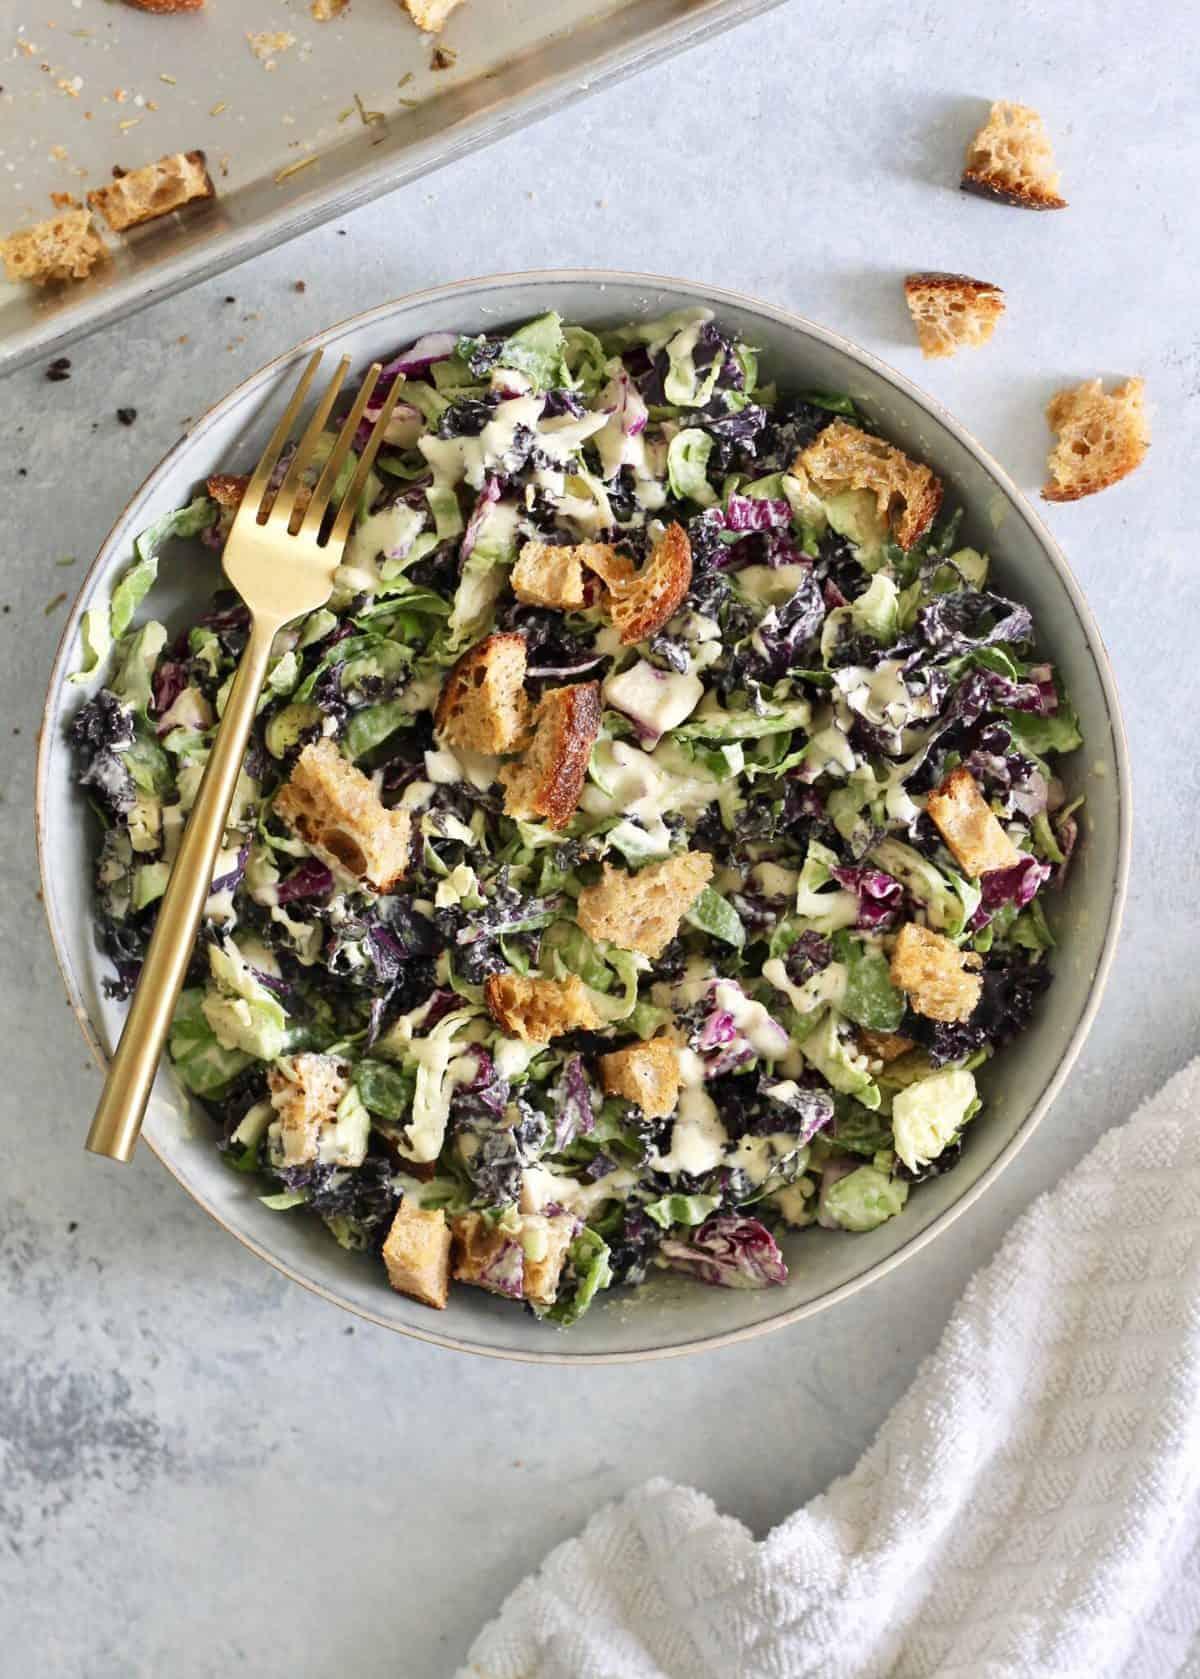 Kale brussel sprout caesar salad